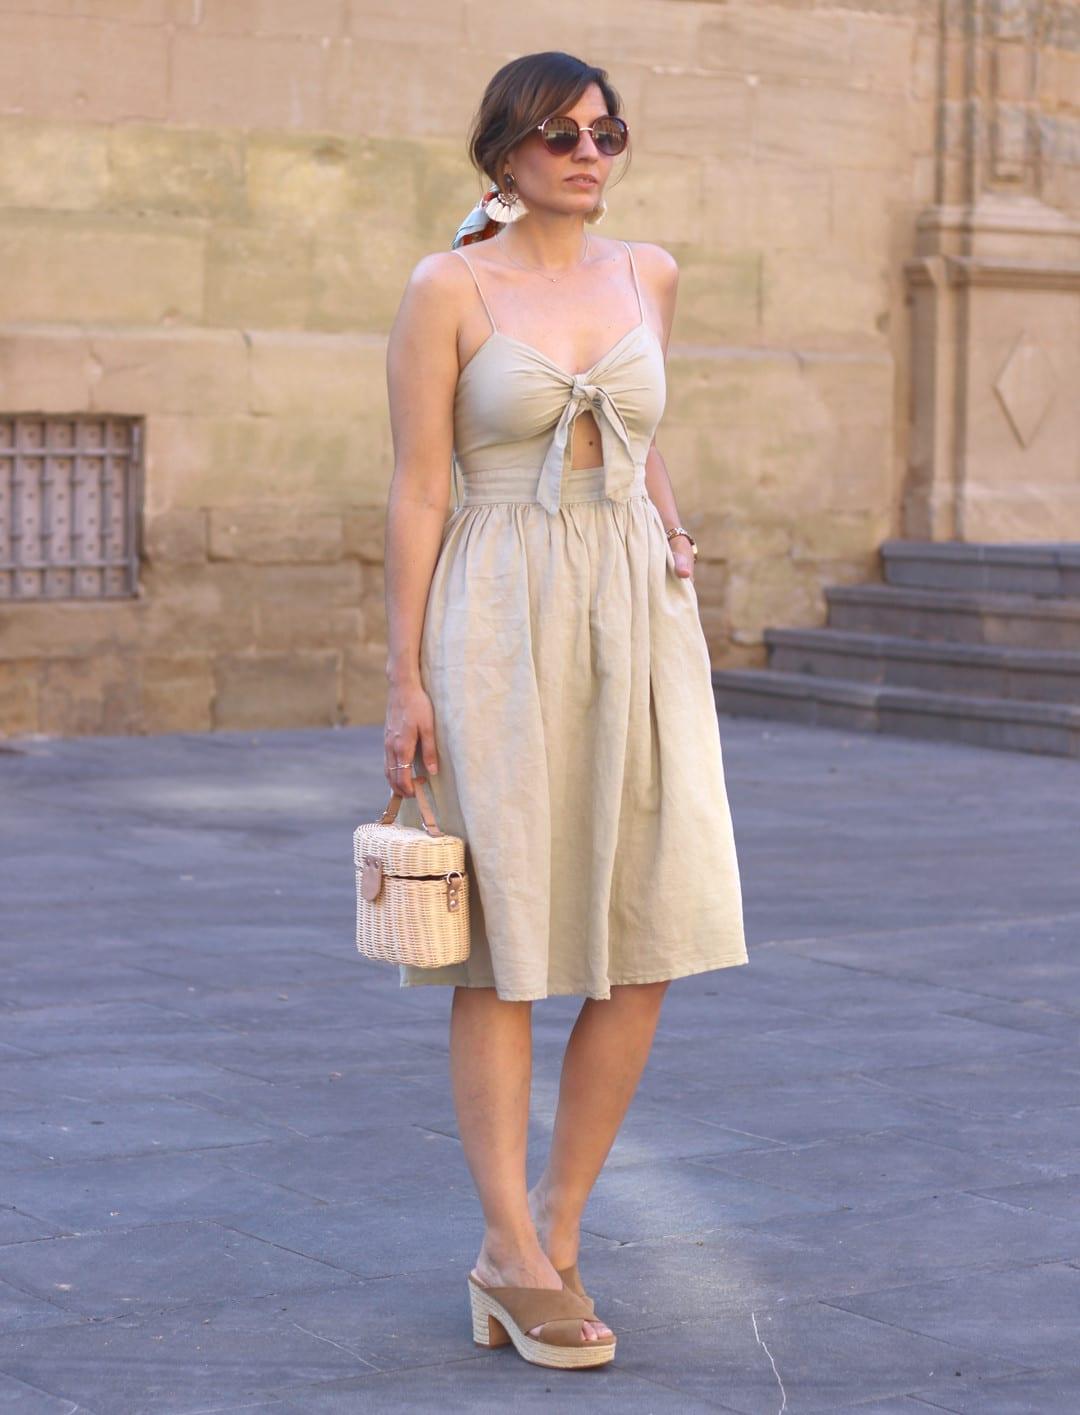 beige midi dress outfit ideas